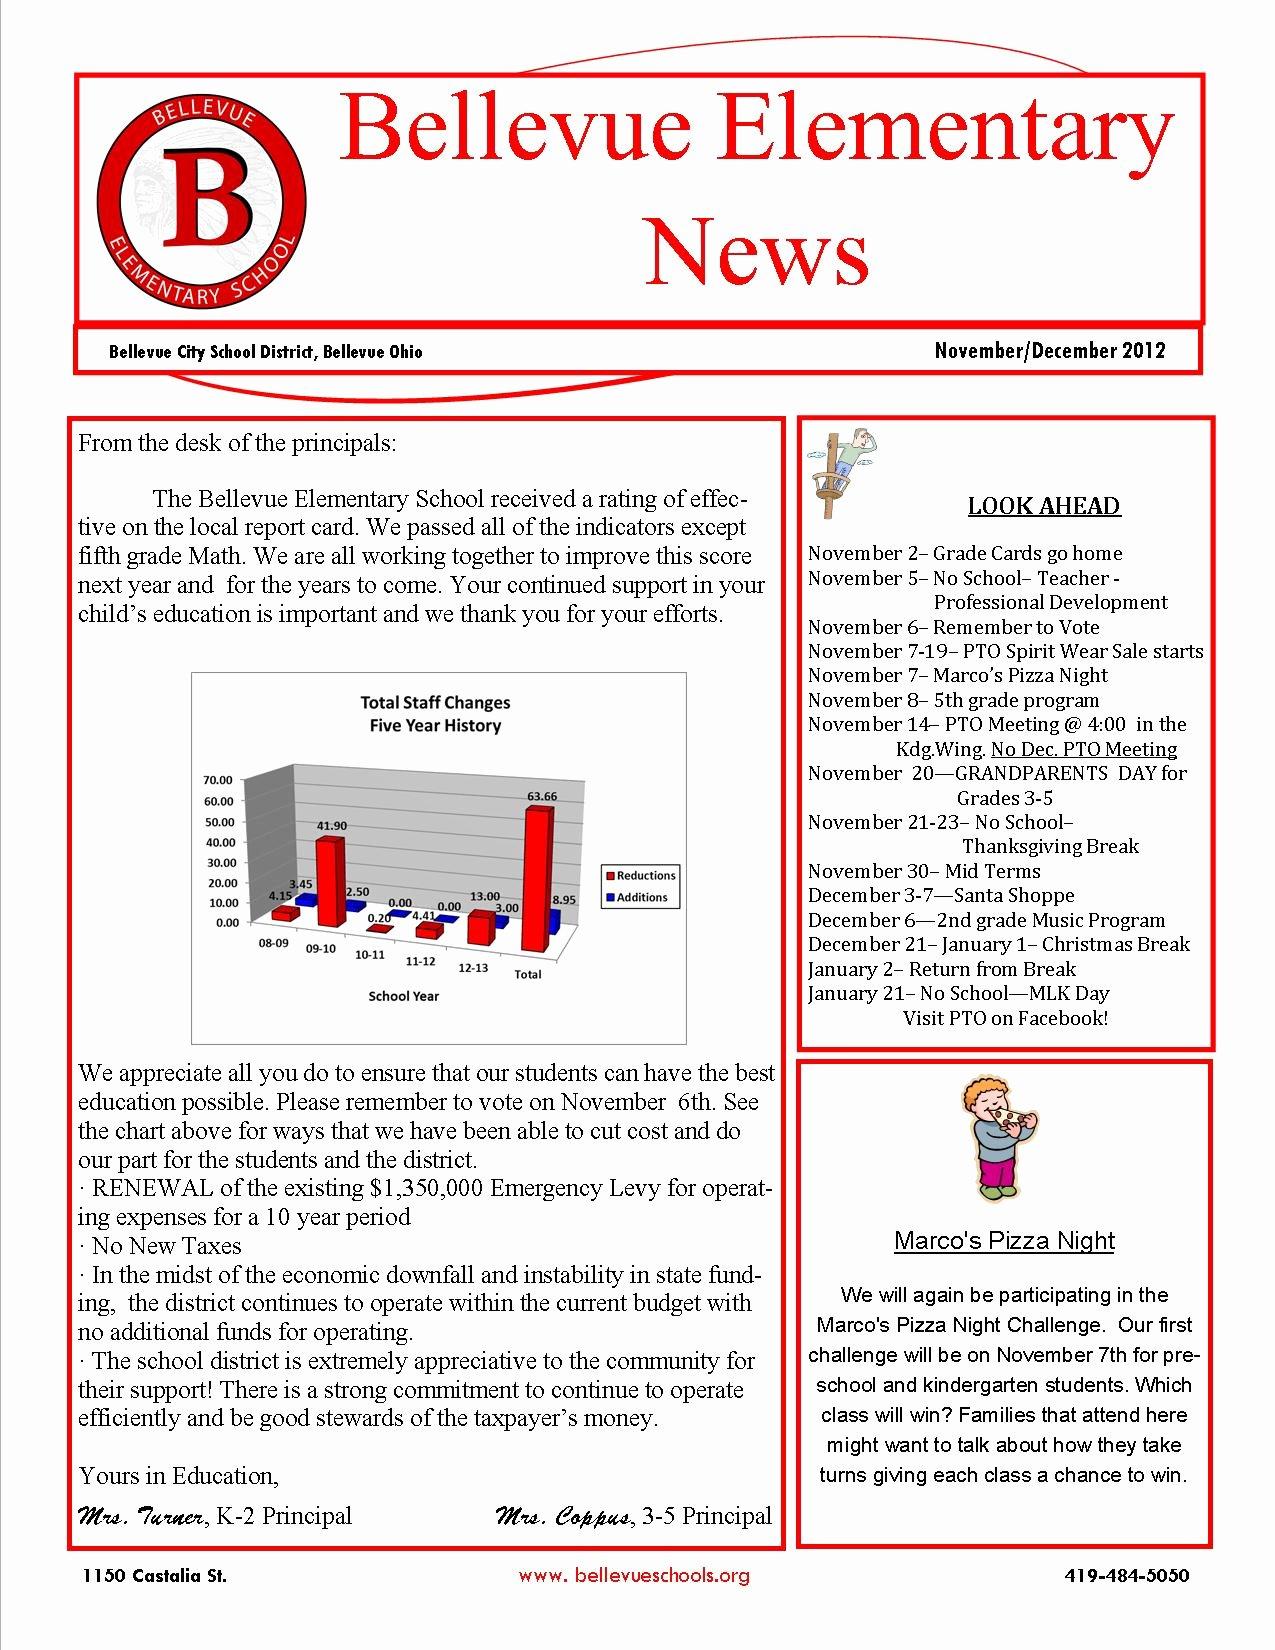 Elementary School Newsletter Template Unique Elementary School Newsletters 5th Grade Class Newsletter